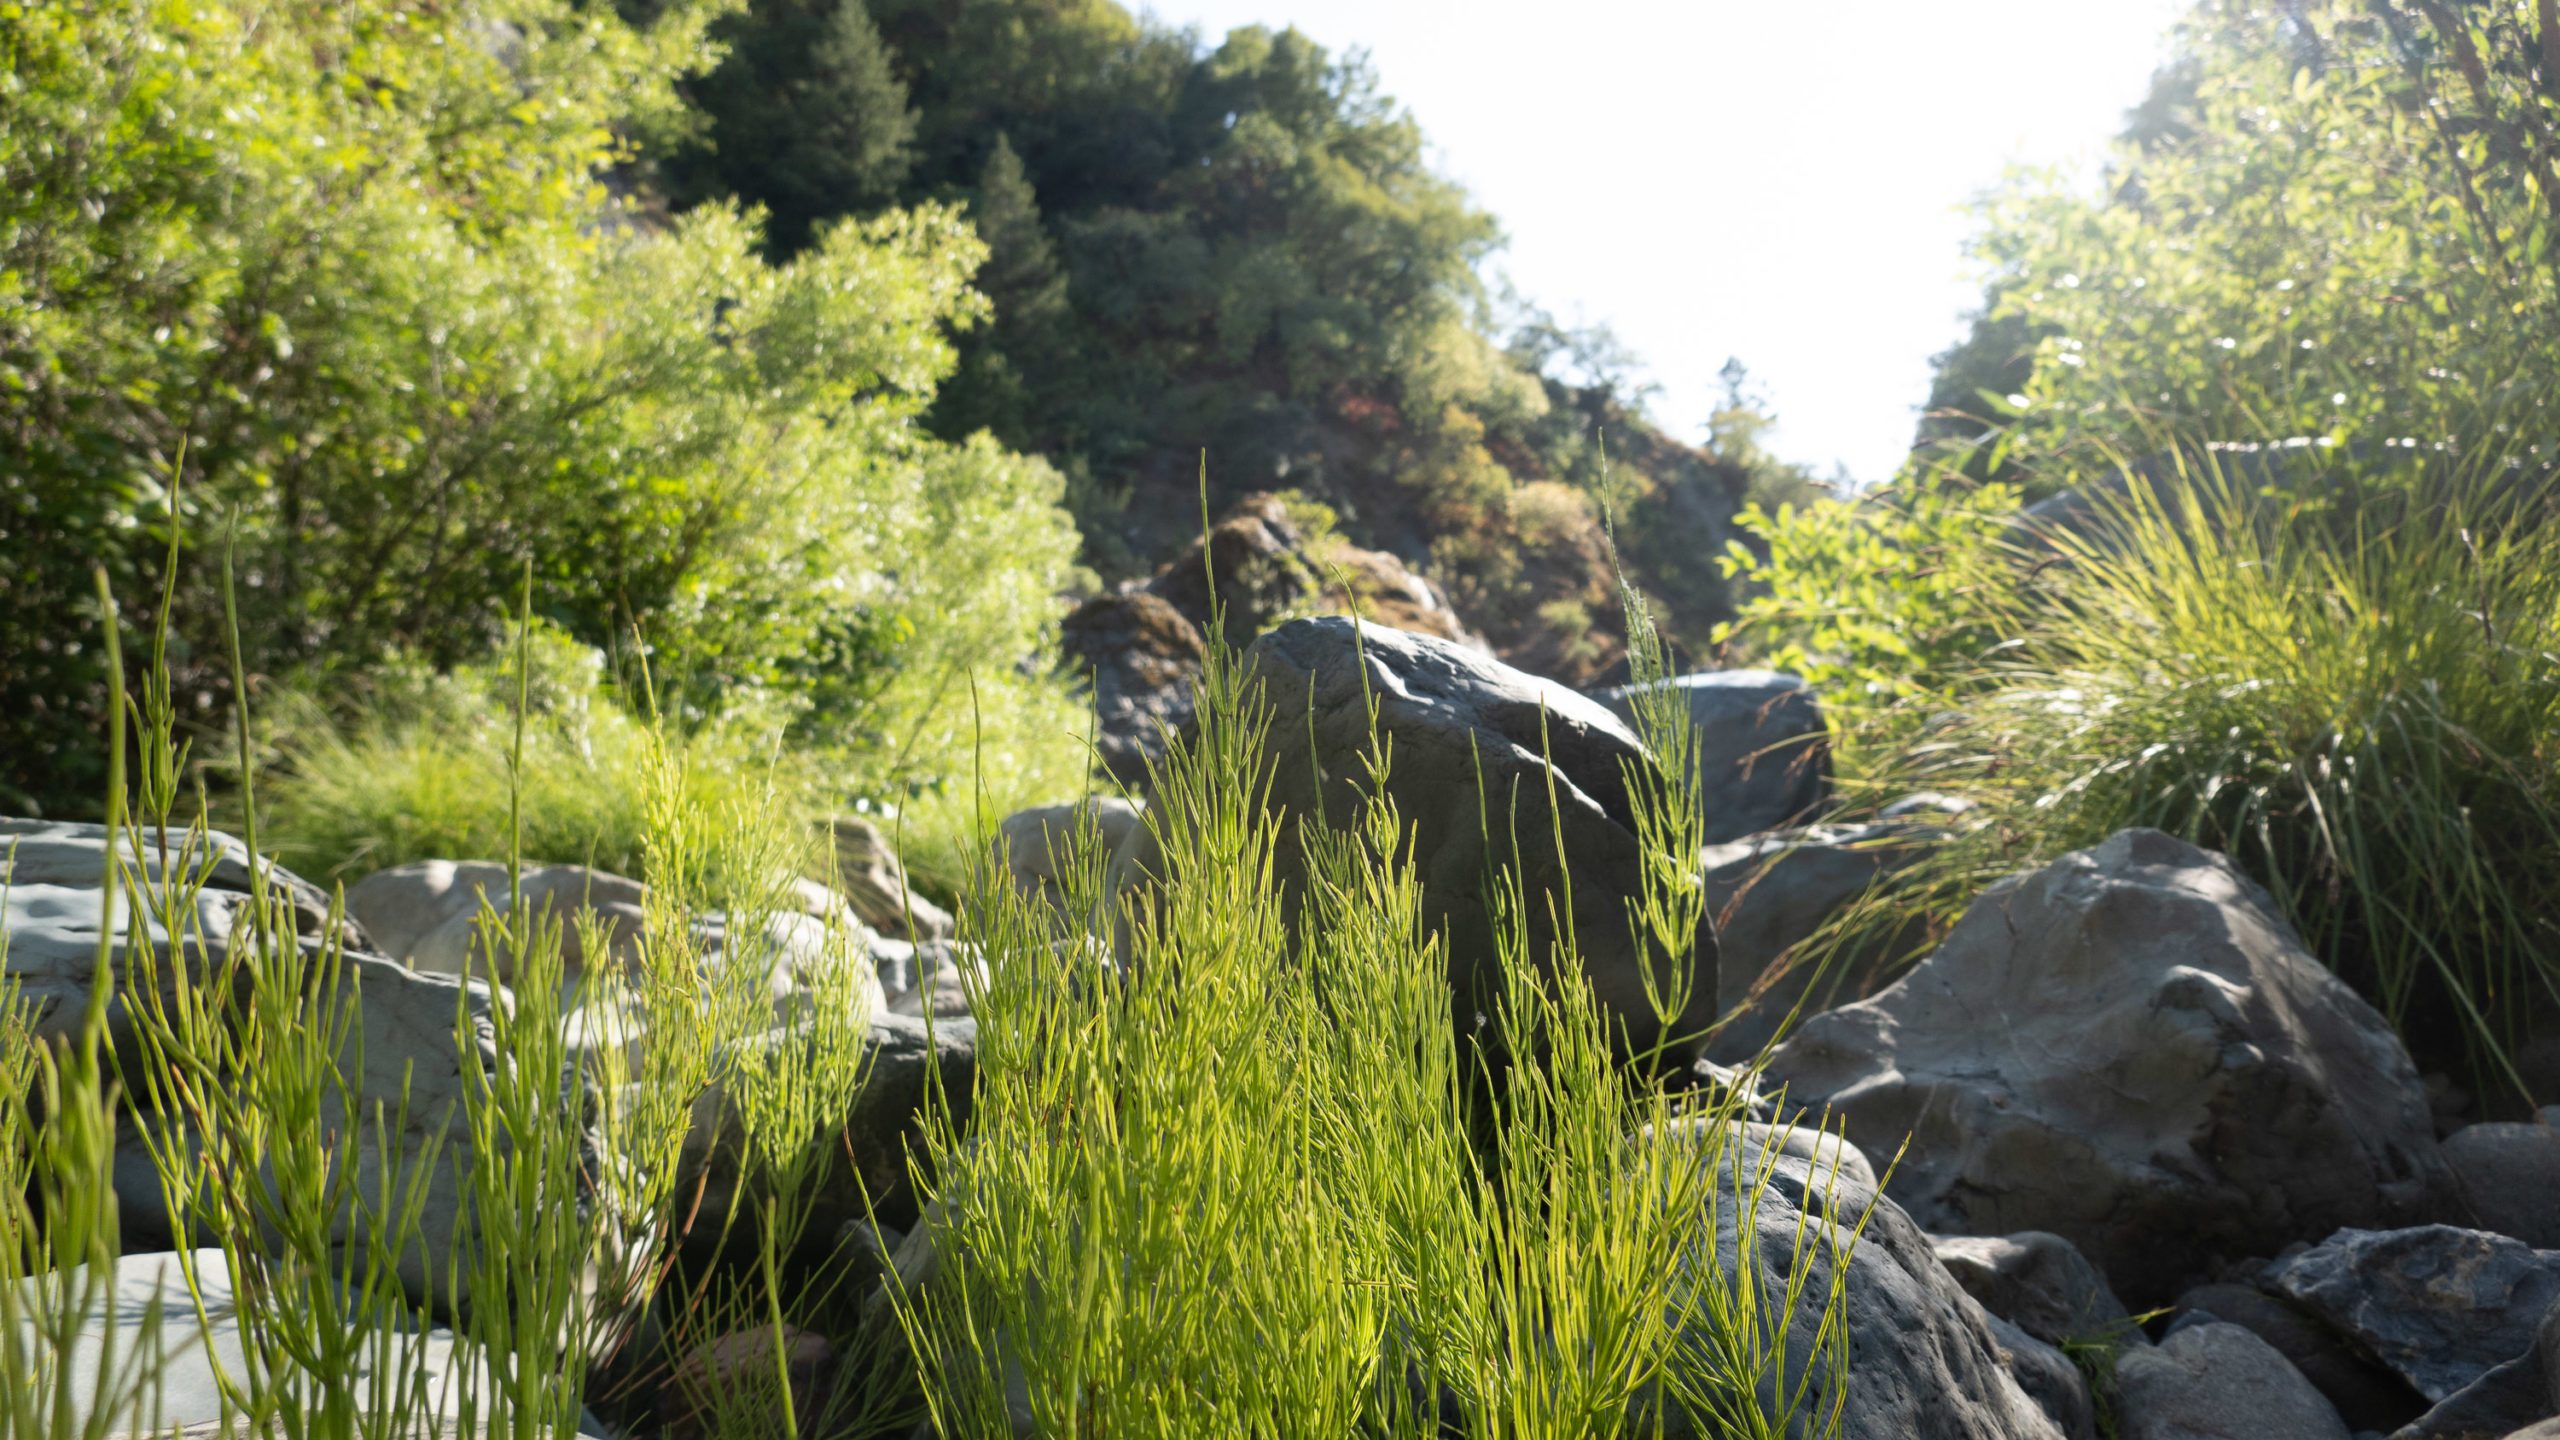 Vegetation grows between rocks in a California creekbed